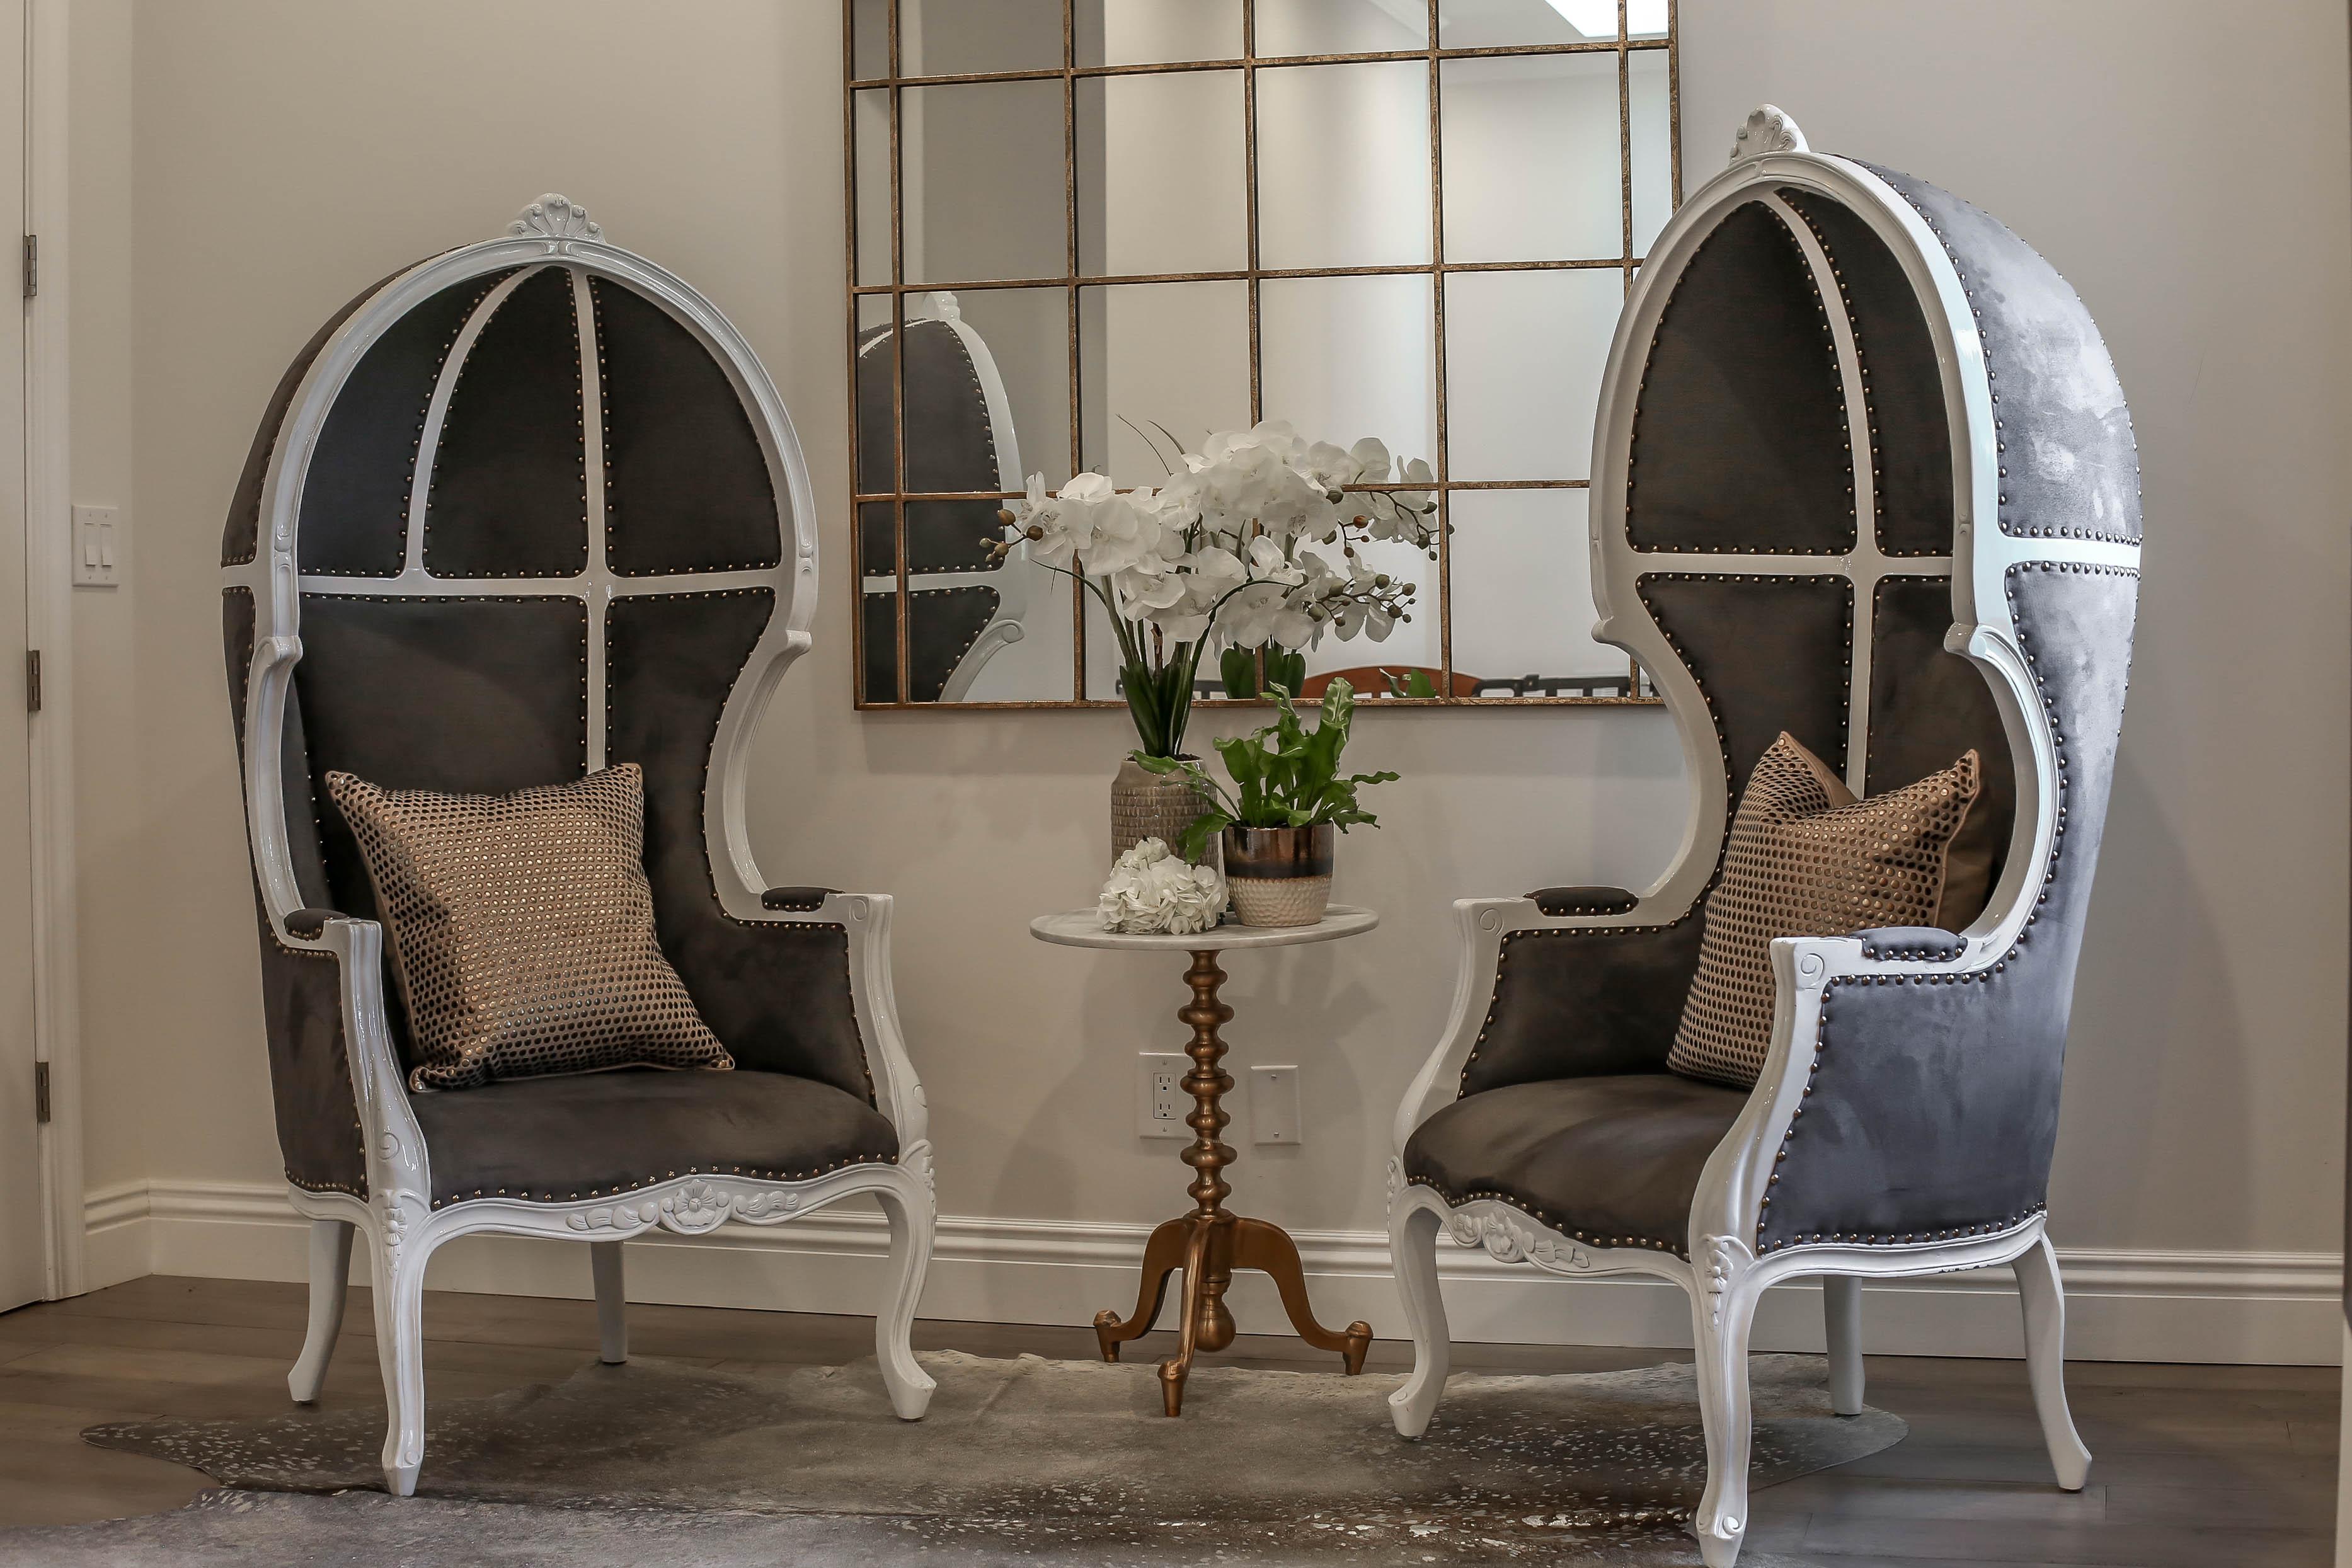 Casa Hacienda Heights Custom Residential Design – Loft Dome Chairs